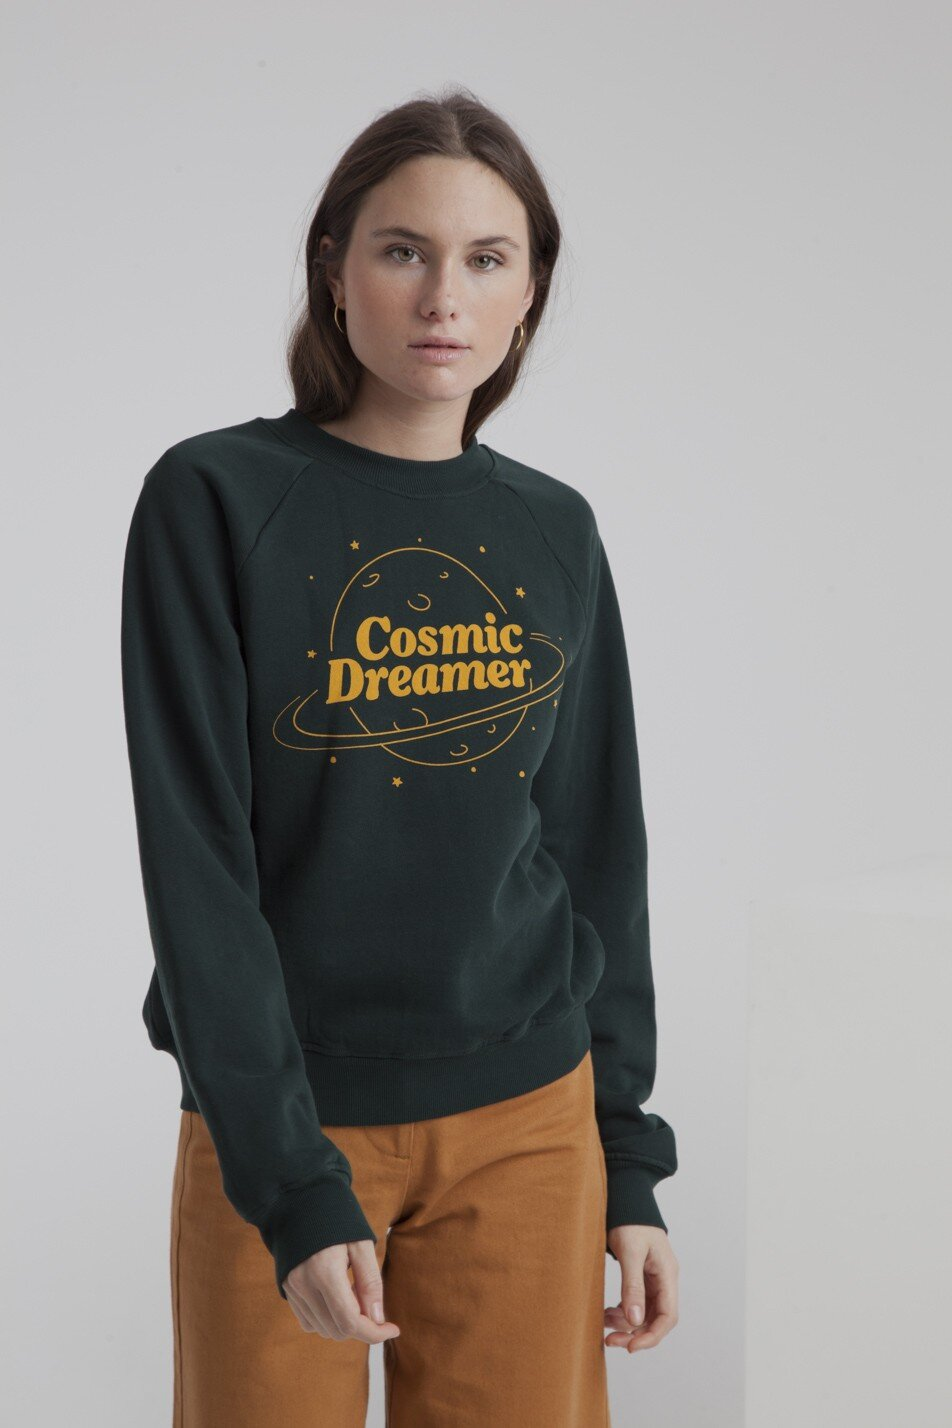 cosmic-dreamer-raglan-sweatshirt.jpg